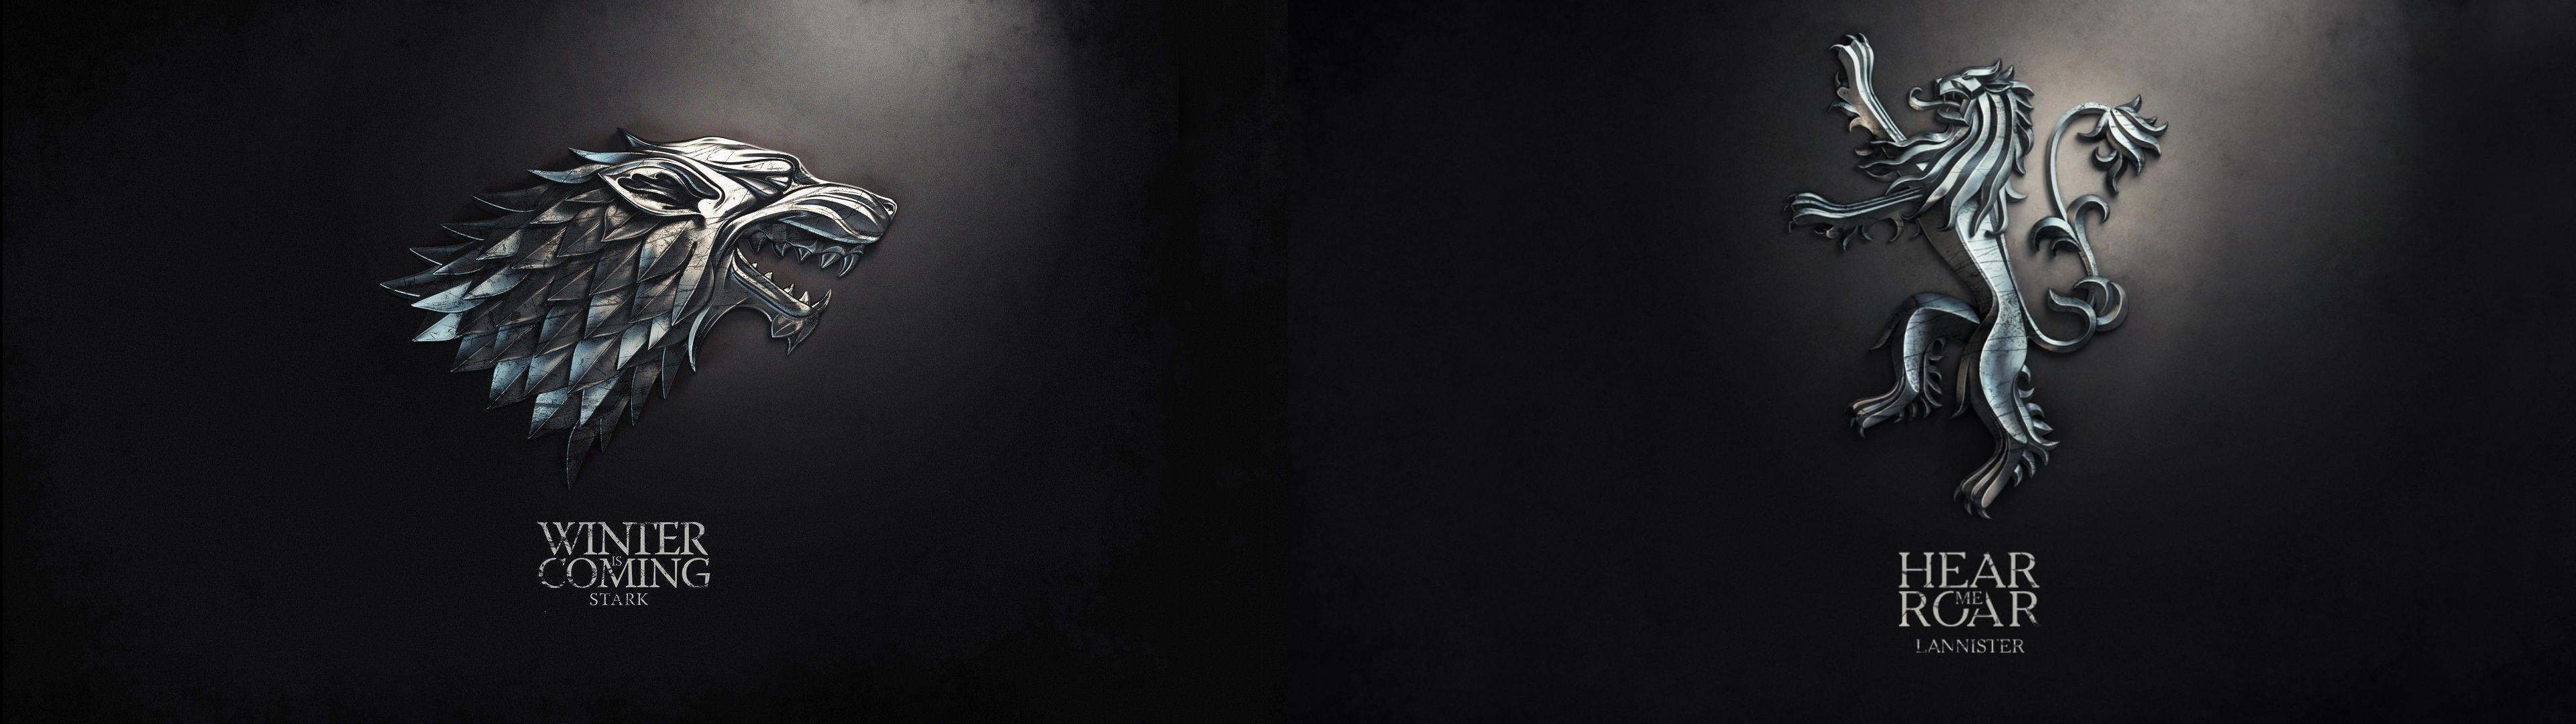 3840x1080 Dual monitor wallpapers anyone? - Album on Imgur